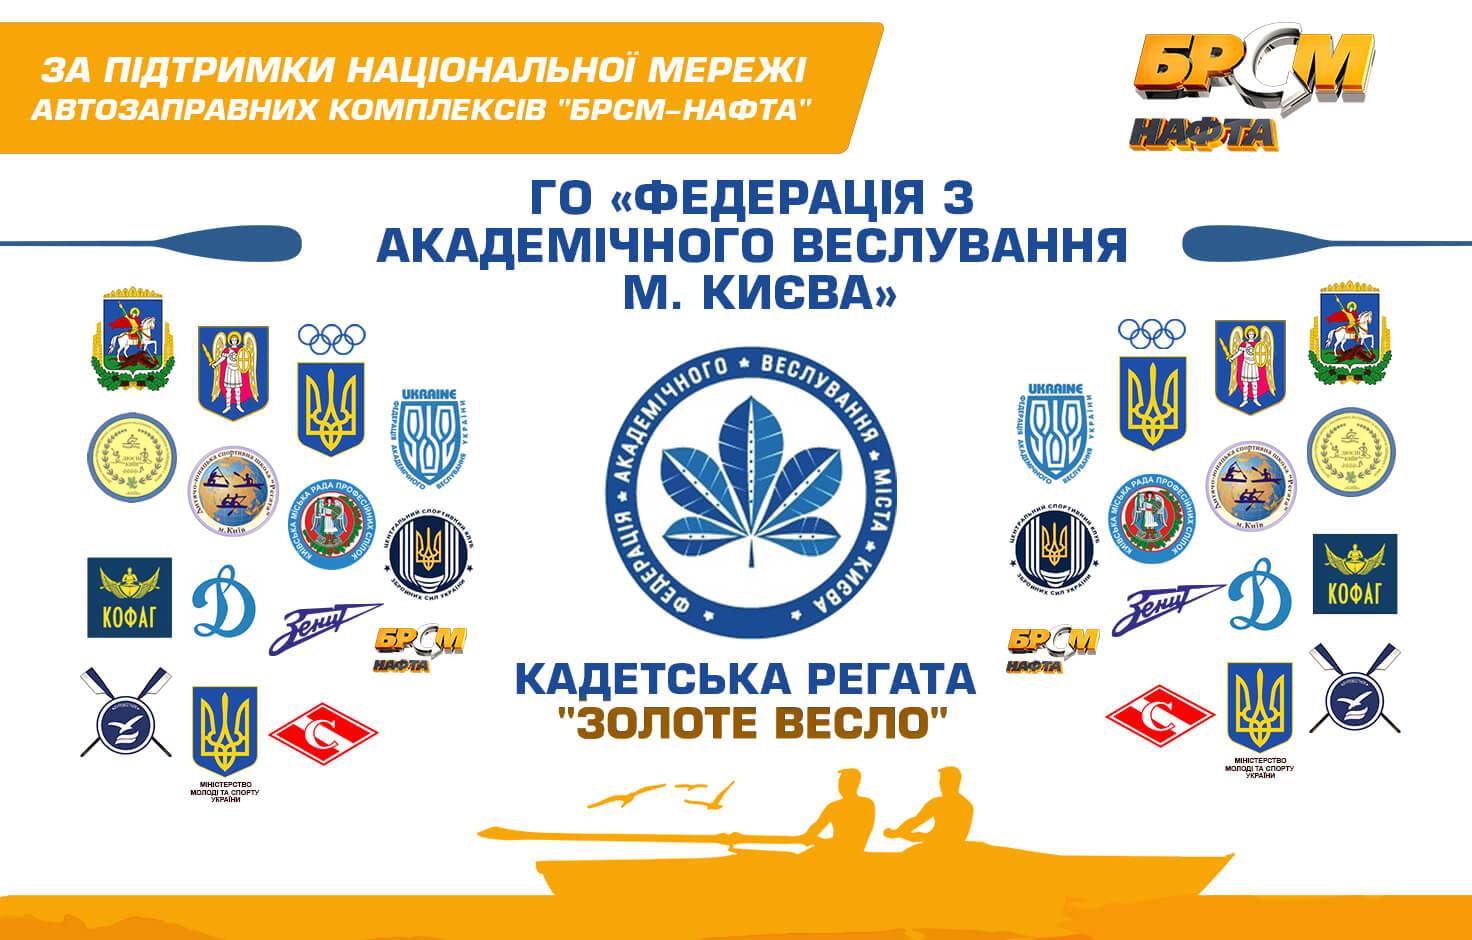 «БРСМ-Нафта» виступить спонсором Всеукраїнських змагань з академічного веслування – регата «Золоте весло».